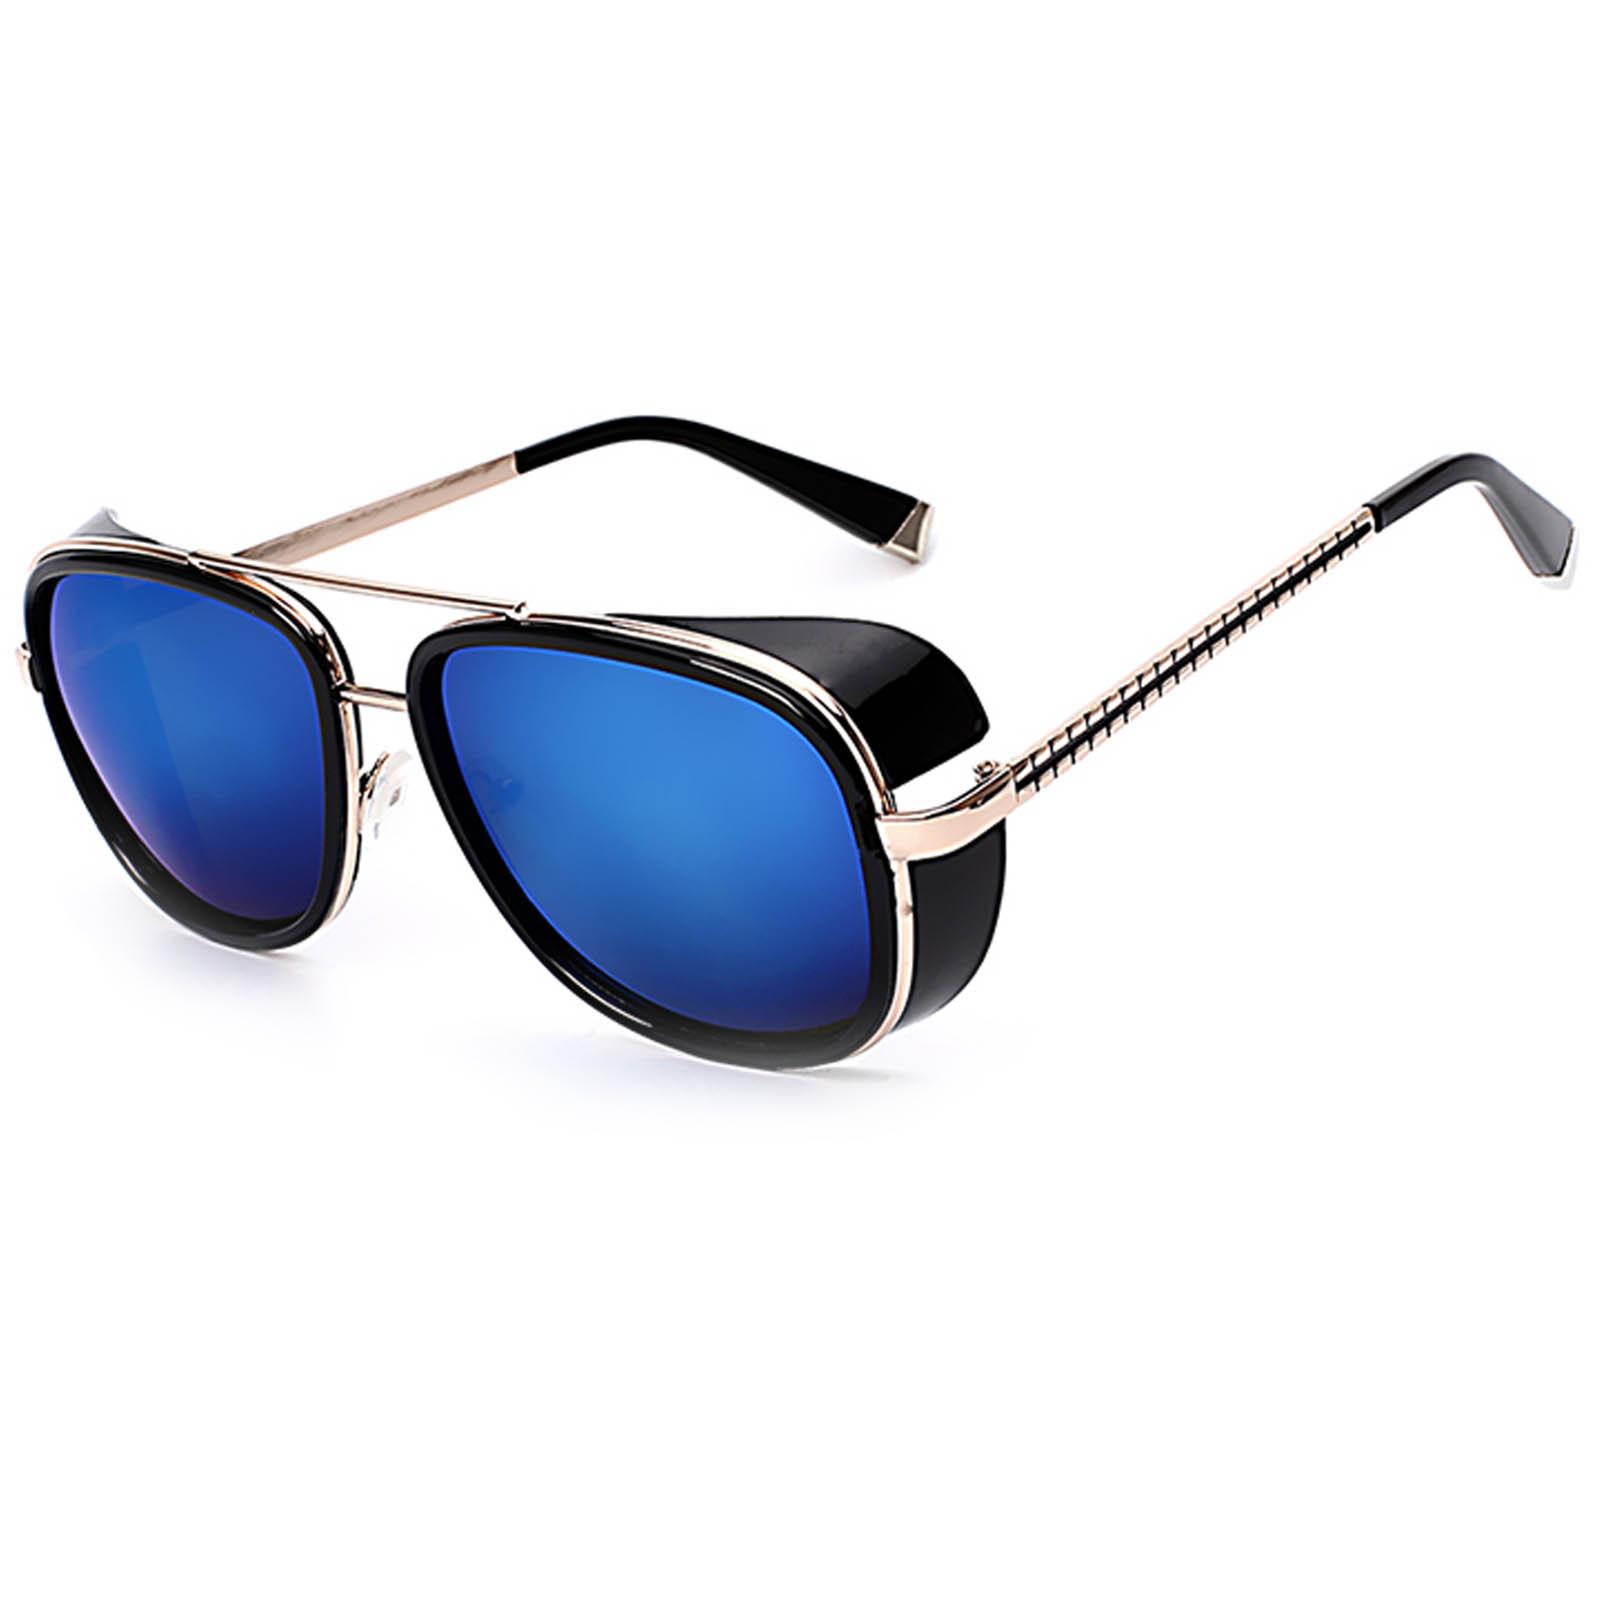 830c114389 OWL ® 002 C8 Aviator Eyewear Sunglasses Women s Men s Metal Black Frame  Blue Lens One Pair